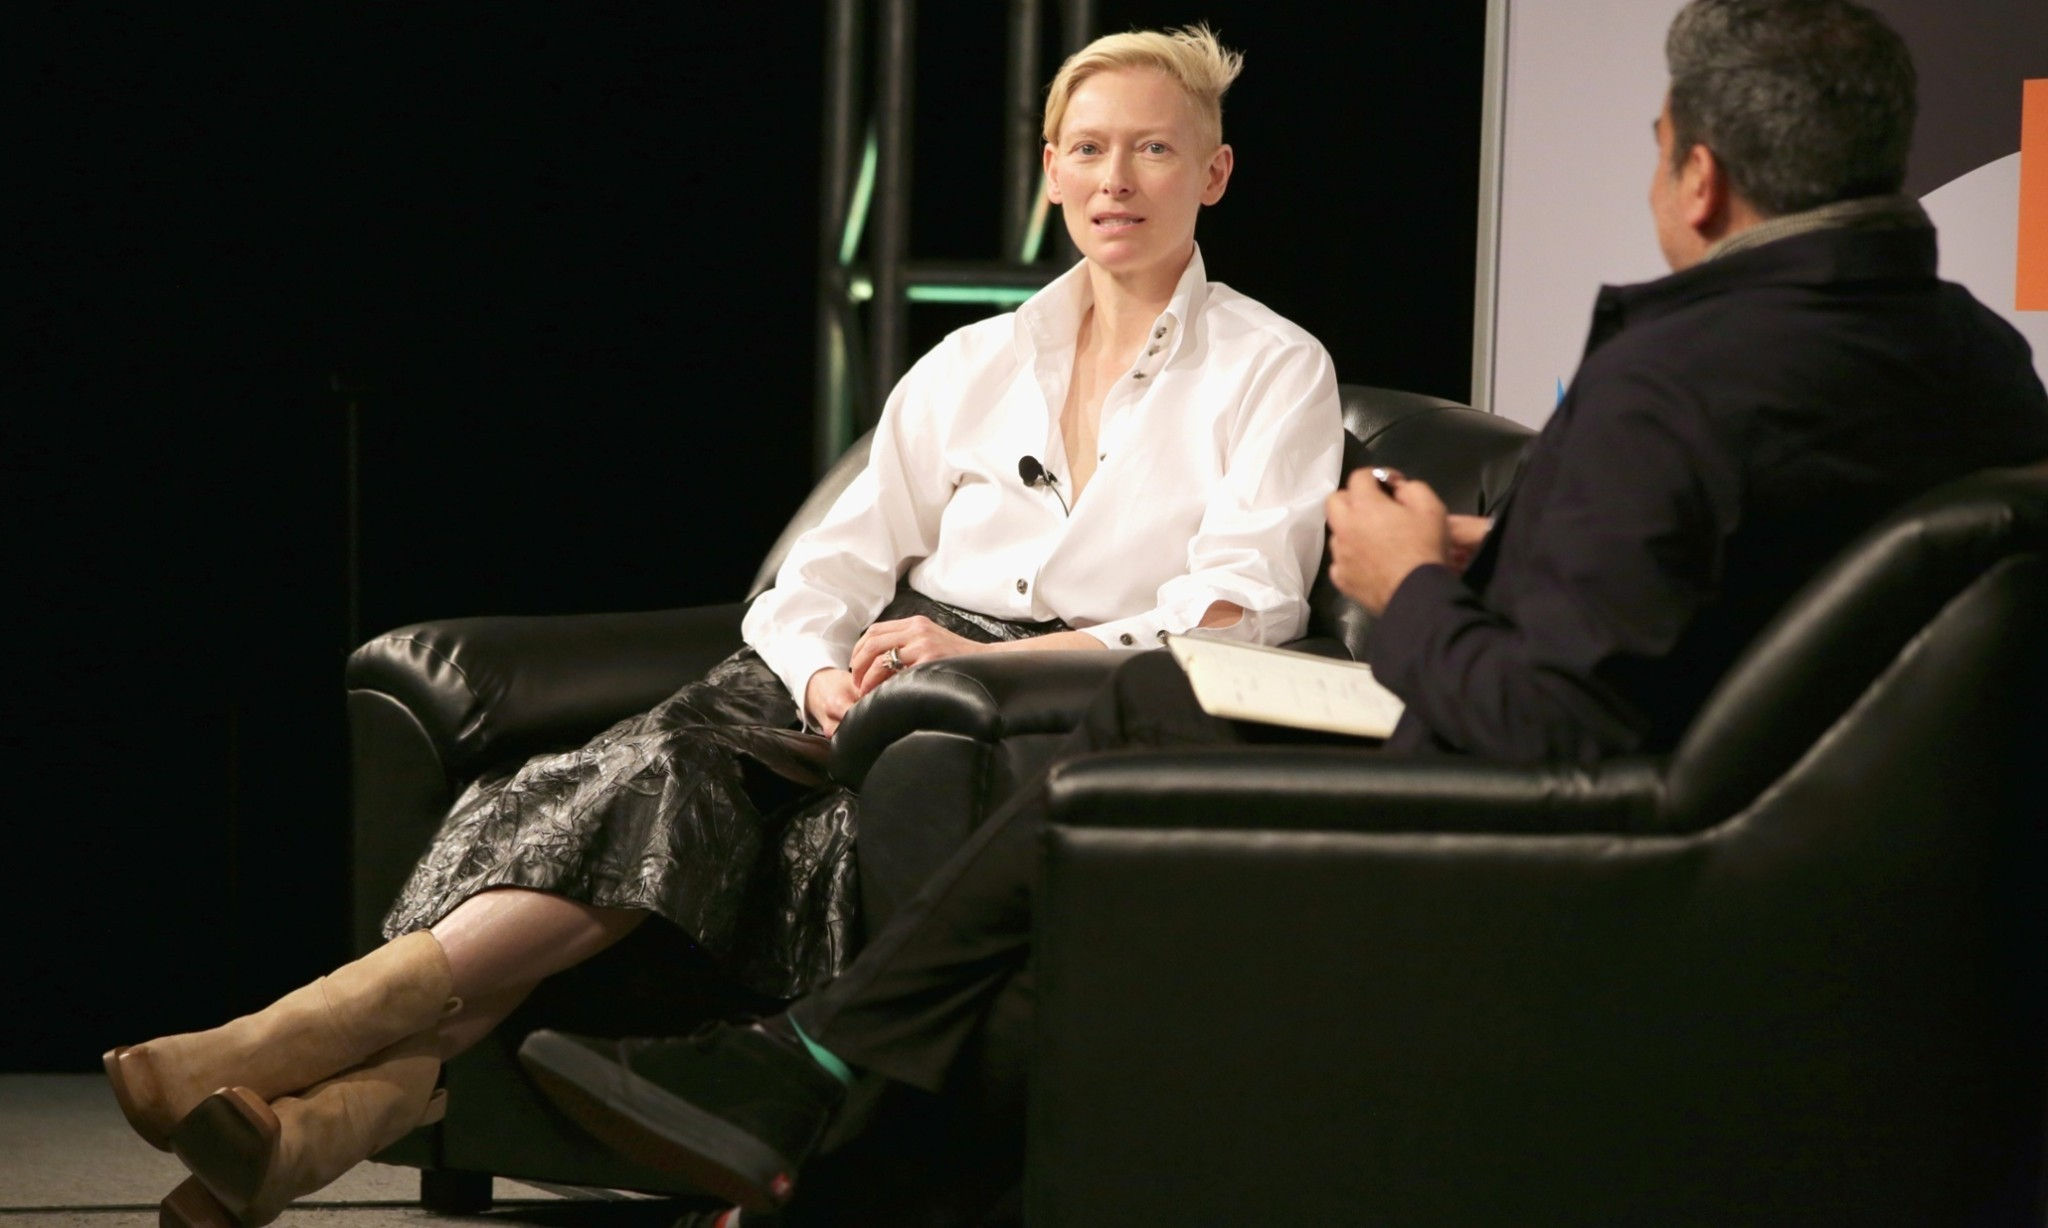 SXSW 2014: Tilda Swinton on Derek Jarman: 'He wrapped the centre around him'